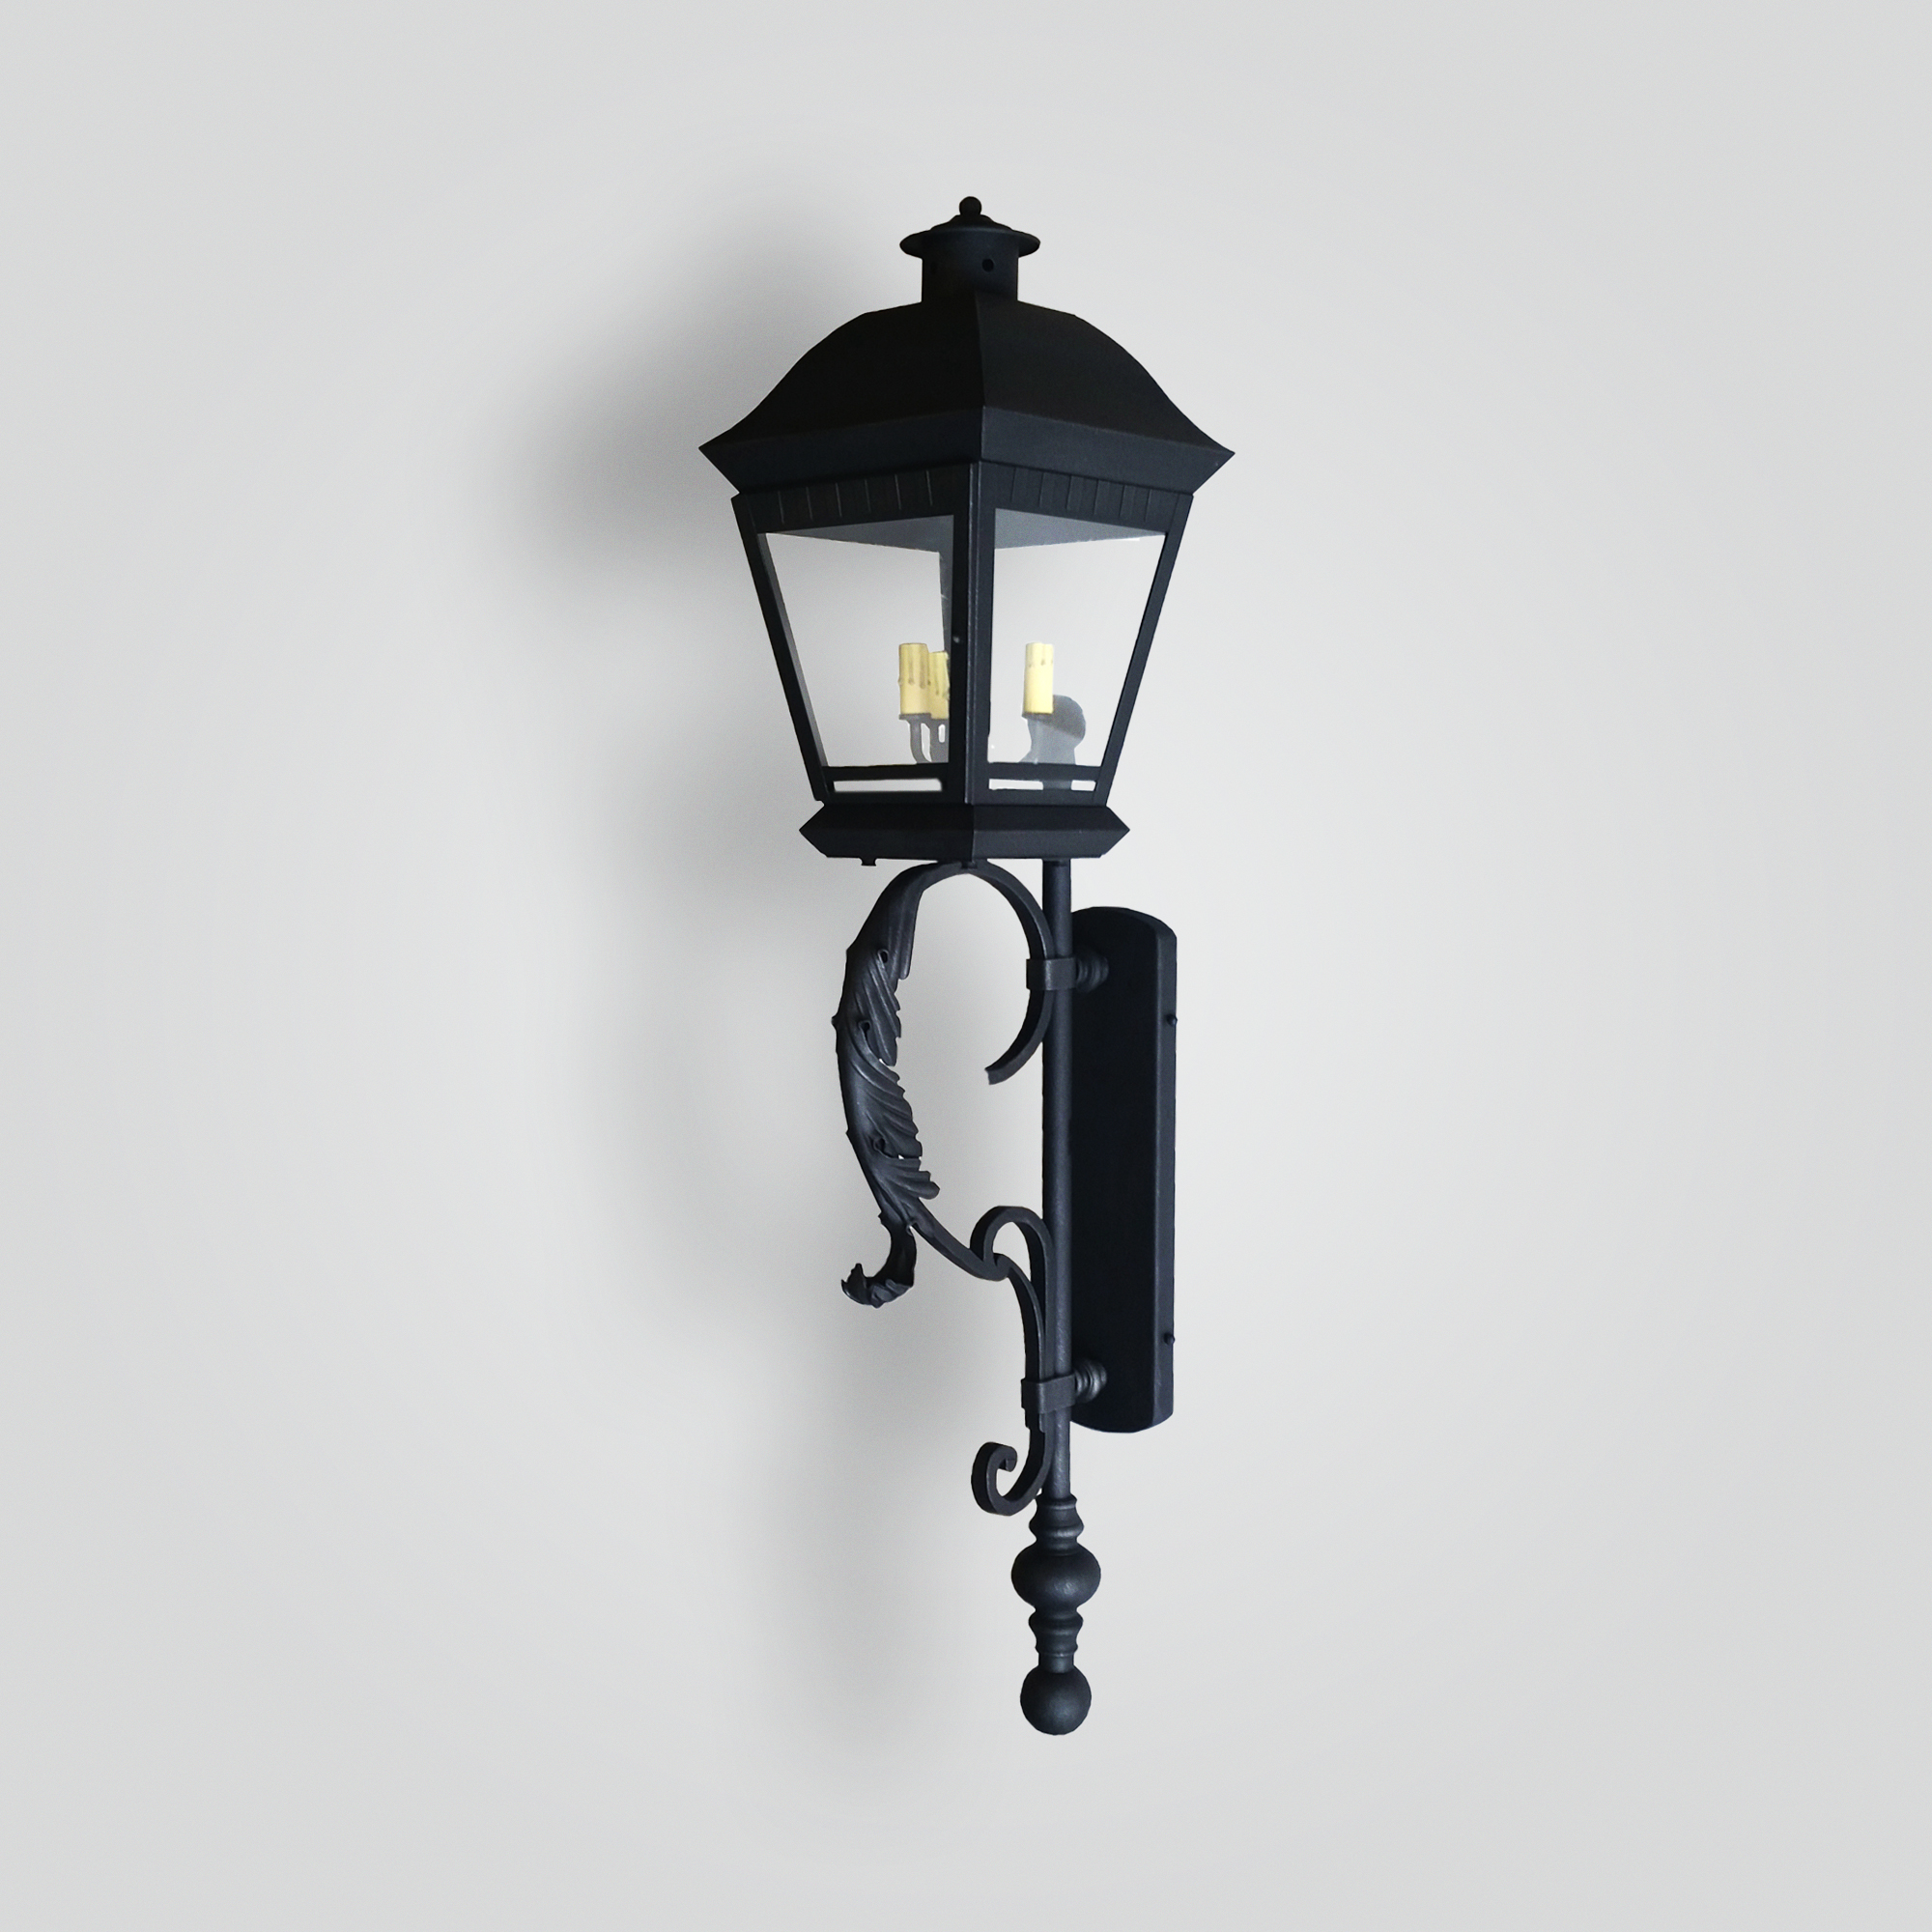 518-cb4-ir-w Bash Wang Wall Lantern On Scroll Arm – ADG Lighting Collection